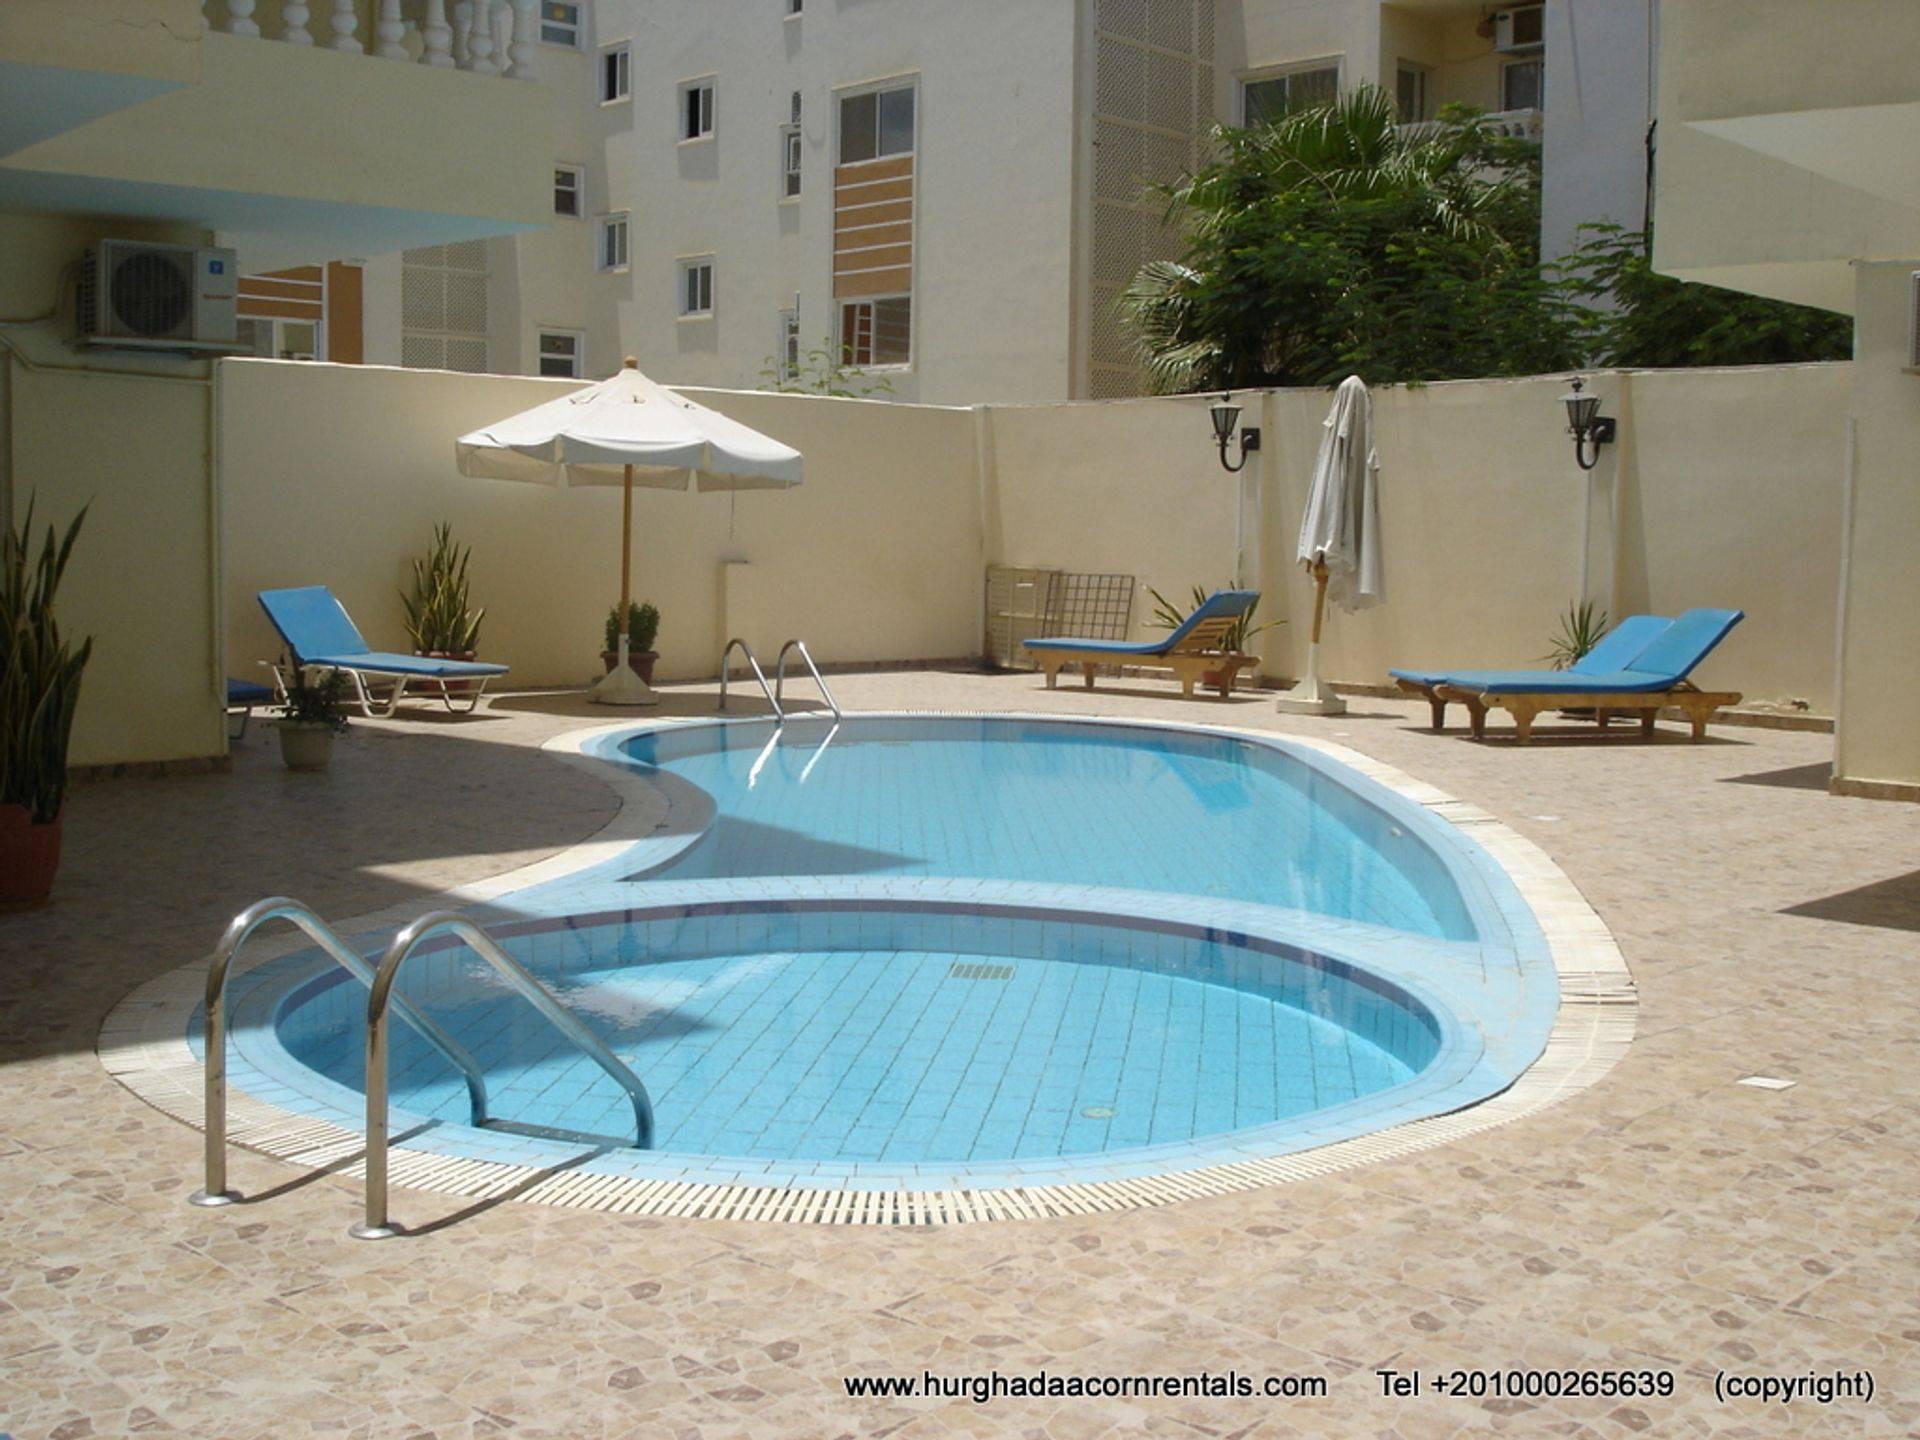 Oasis 5, Intercontinental, Hurghada